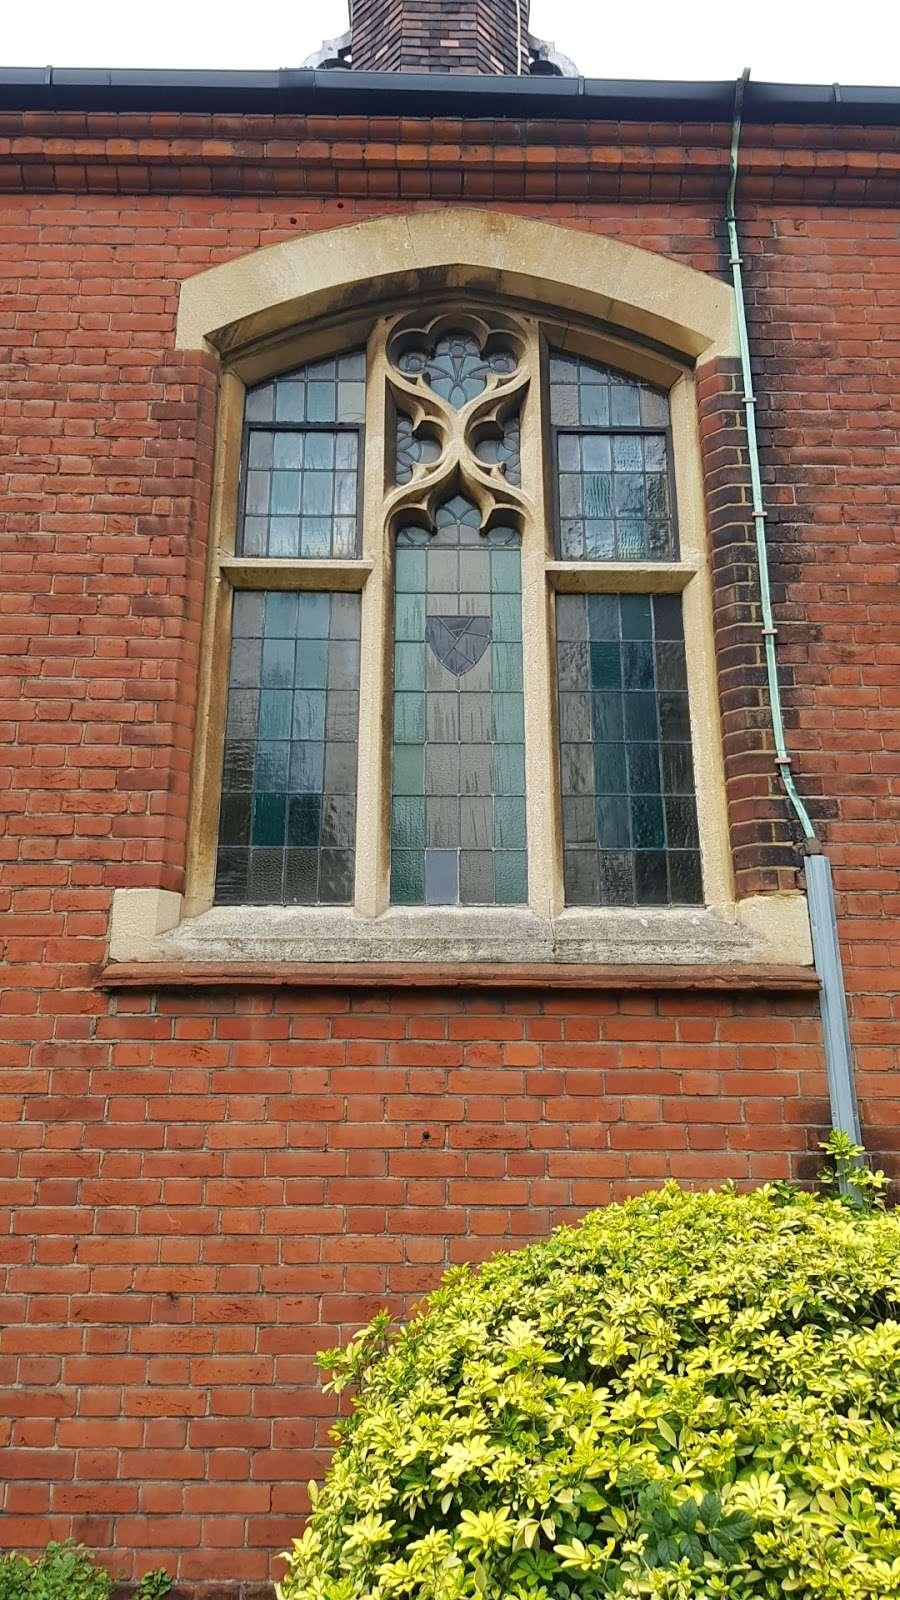 Christ Church - church  | Photo 4 of 9 | Address: Oakleigh Park N, Whetstone, London N20 9AR, UK | Phone: 020 3234 4059